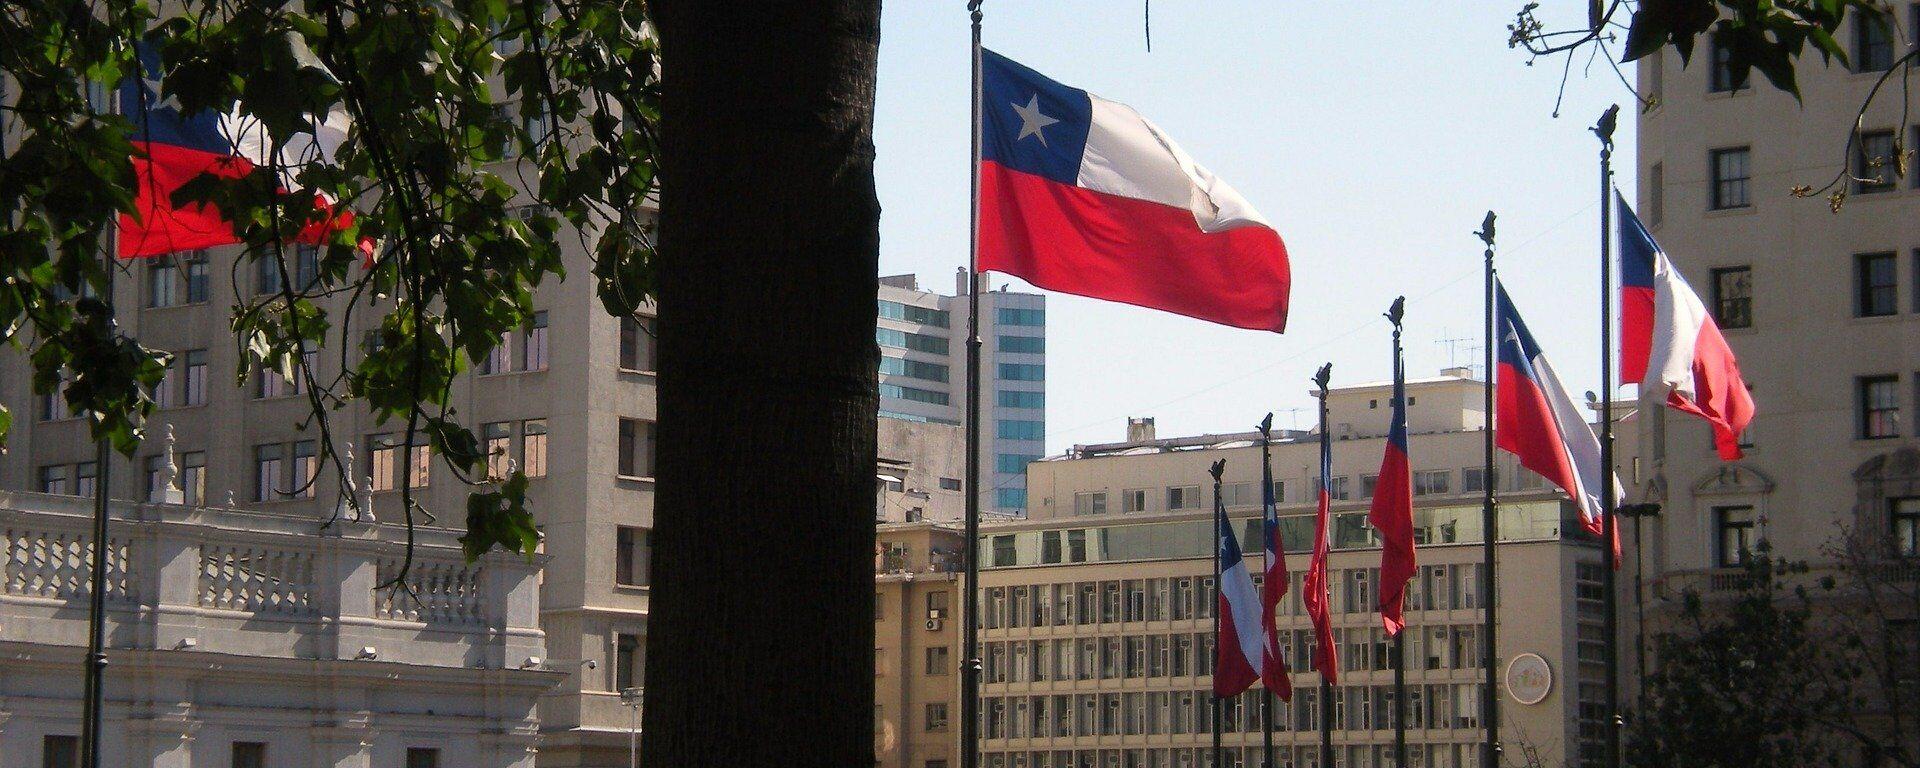 Bandera de Chile - Sputnik Mundo, 1920, 12.08.2021